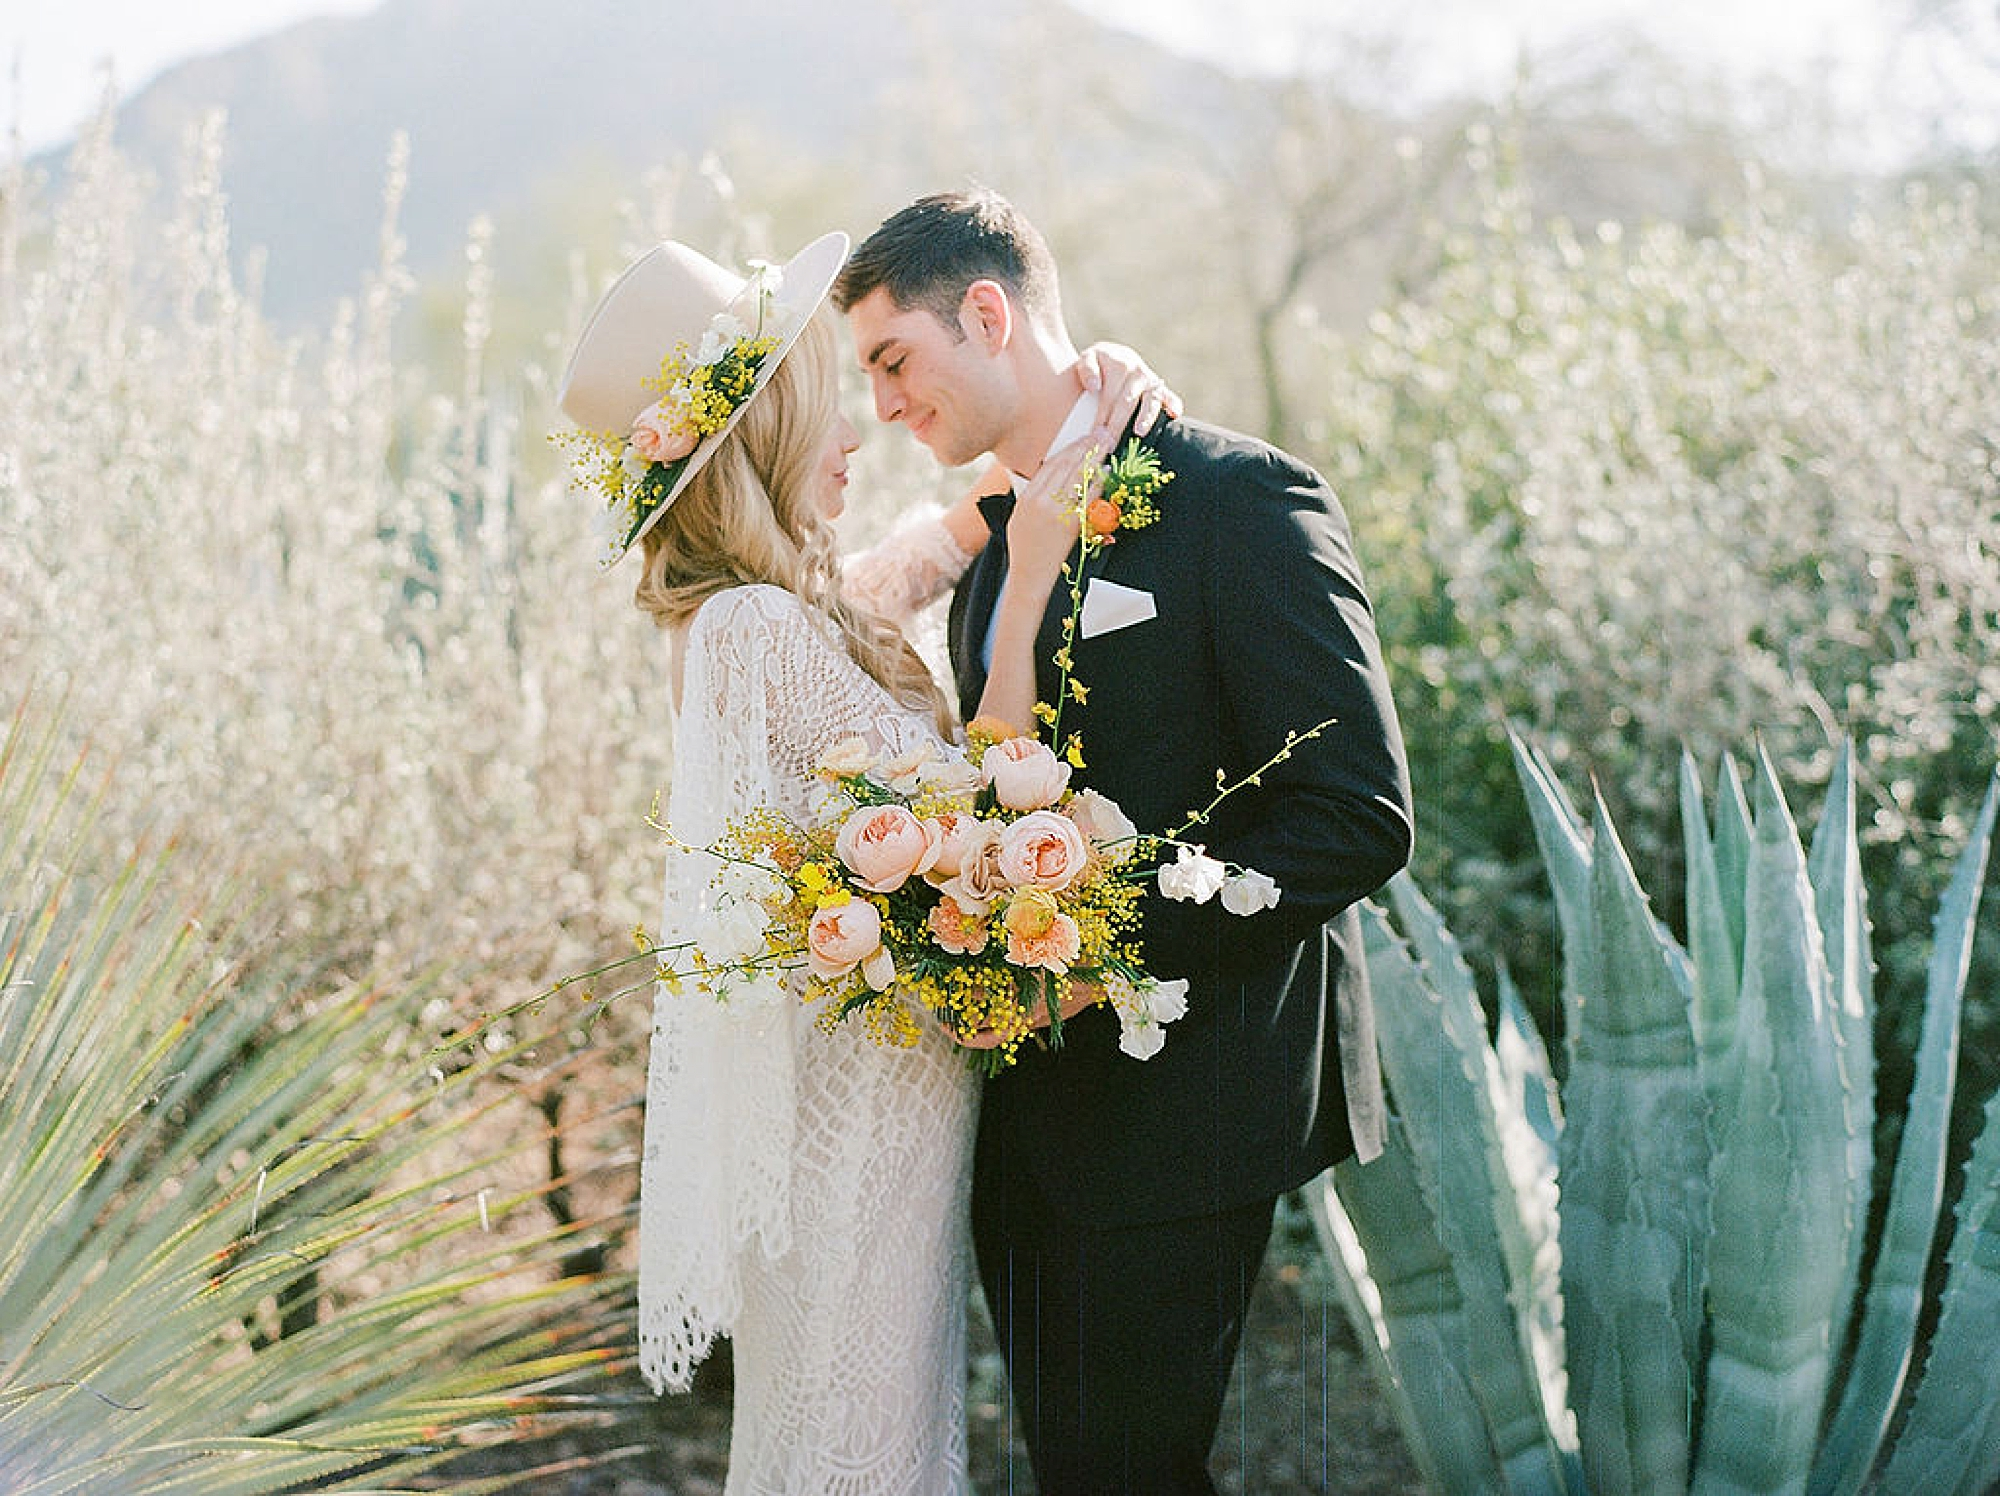 El Chorro Sedona AZ Wedding Photography by Magi Fisher of Magdalena Studios 0038